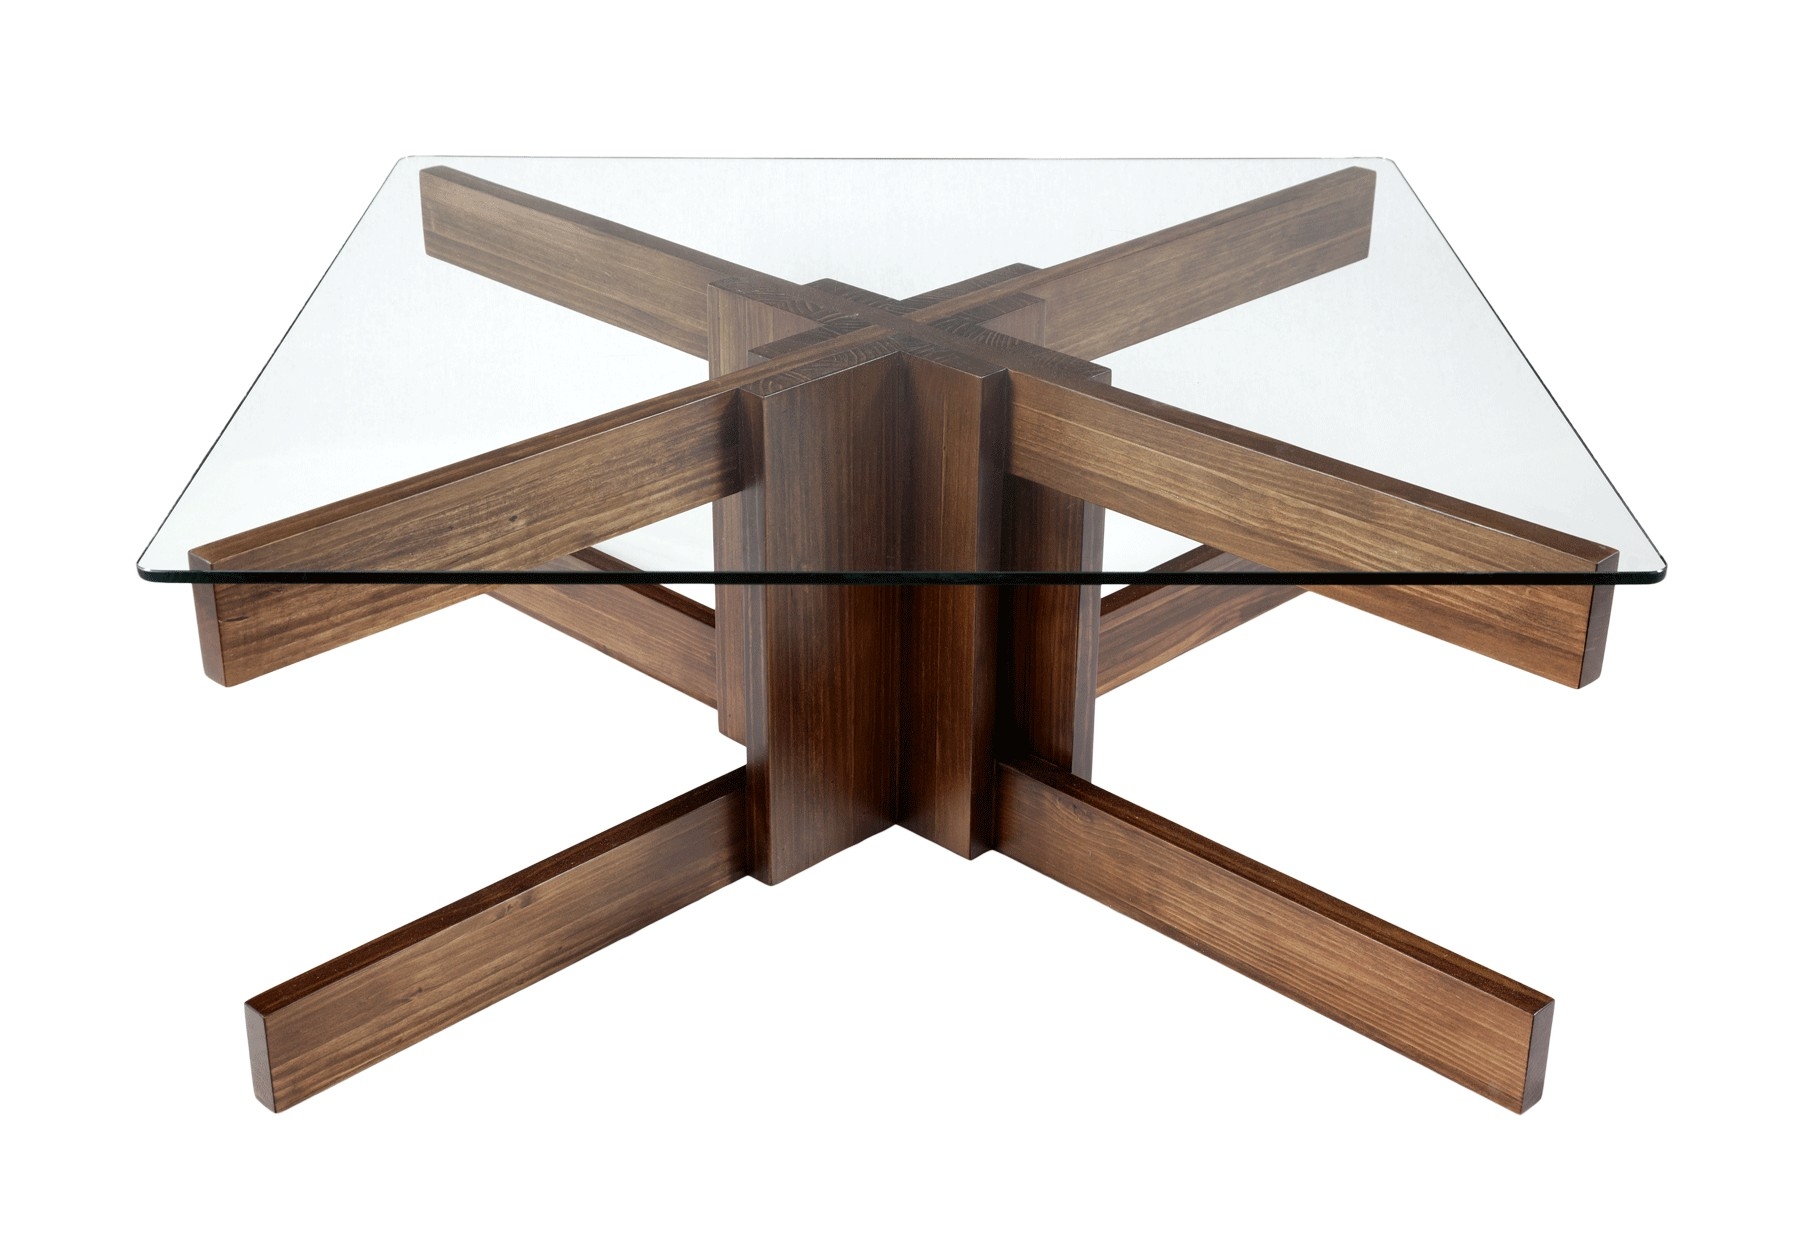 Pie de mesa en madera teñida de nogal oscuro